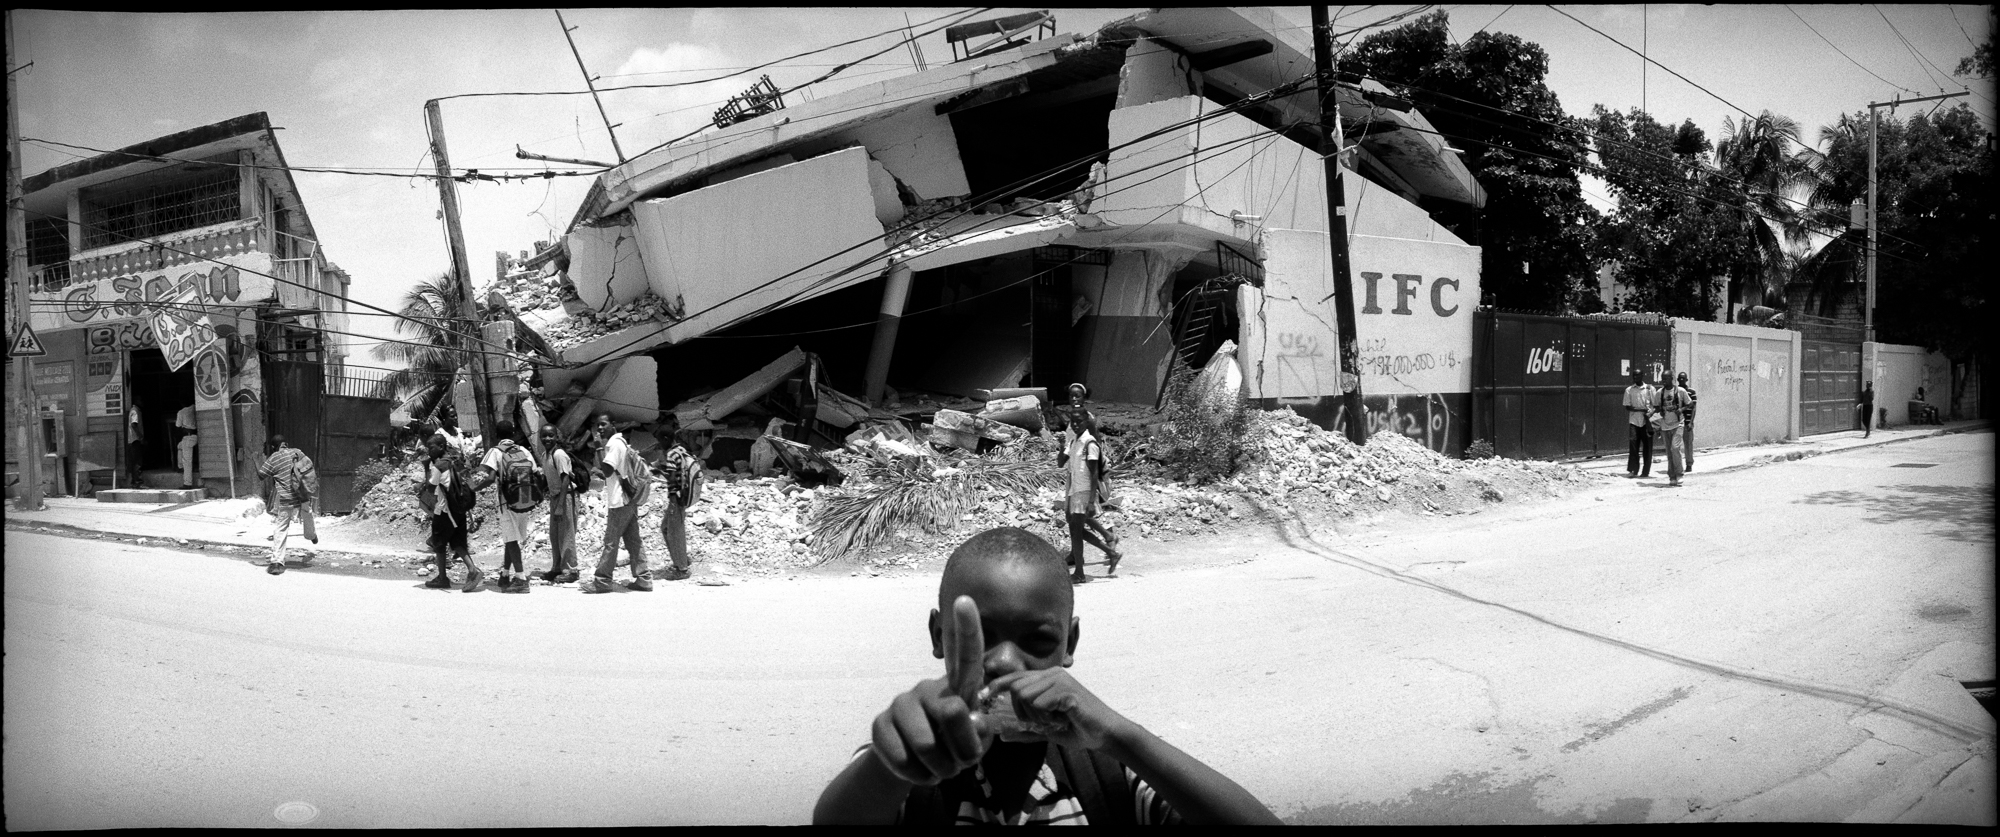 117_haiti_0710_pano_01_28a.jpg